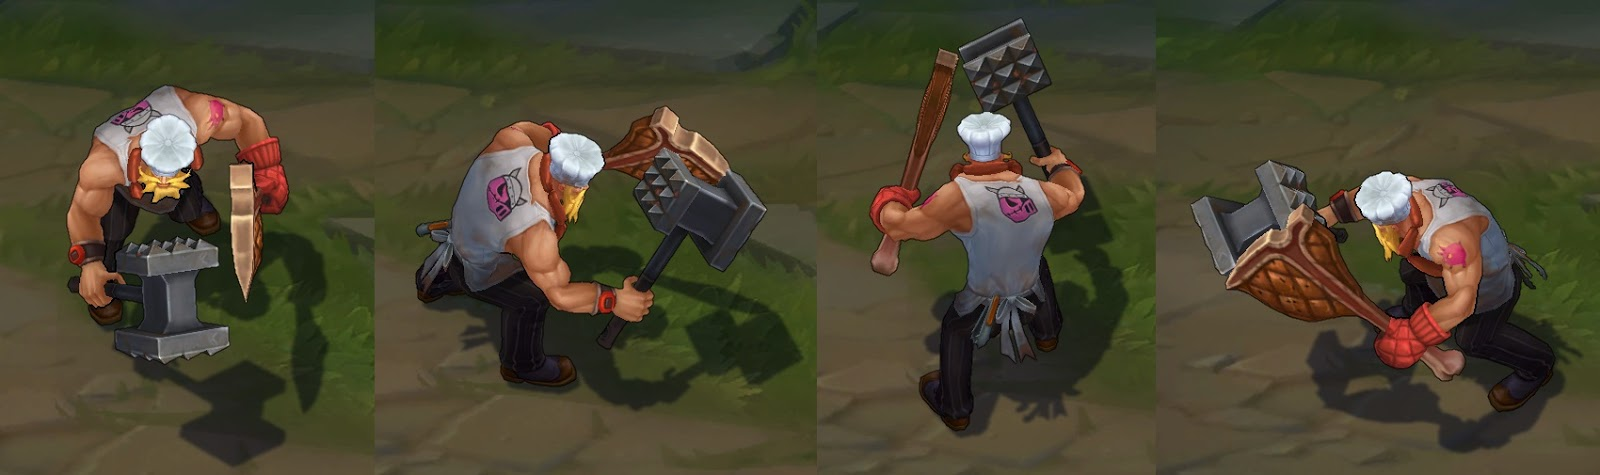 Butcher Olaf skin